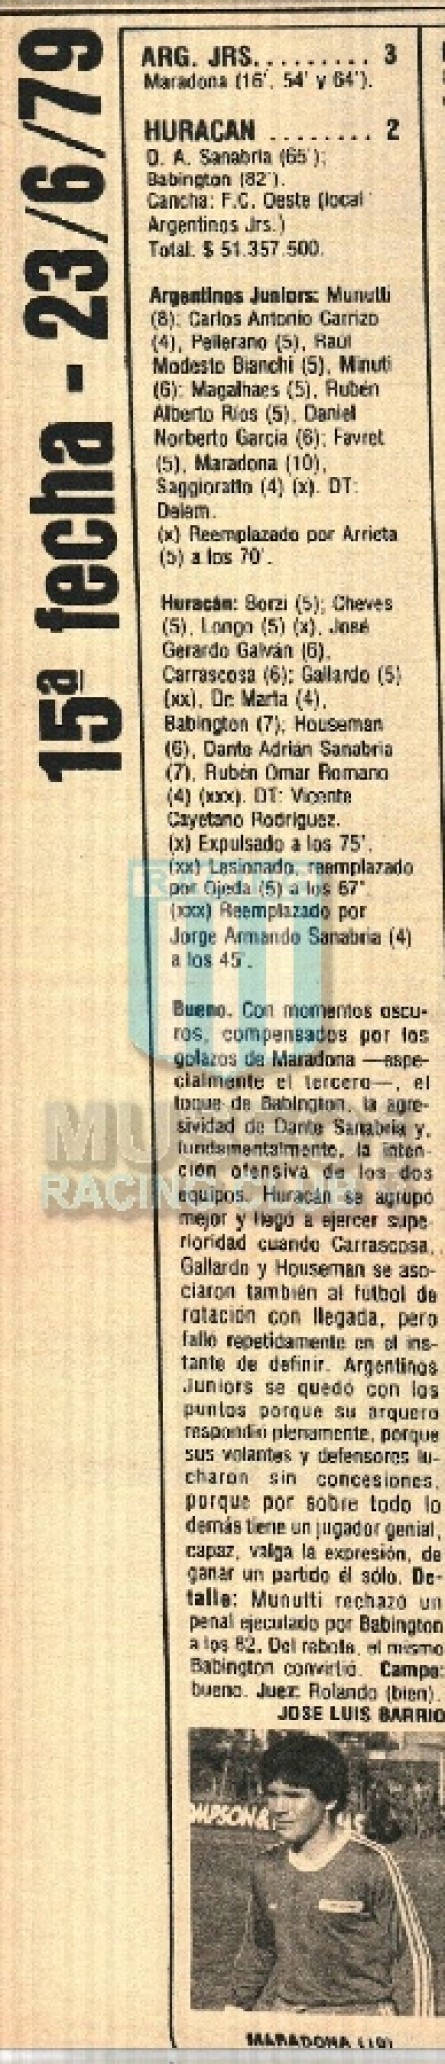 ArgentinosJrs_1979_Home_Adidas_Austral_15taFechaTMvsHuracan_FICHA_ML_10_DiegoMaradona_jugador_01